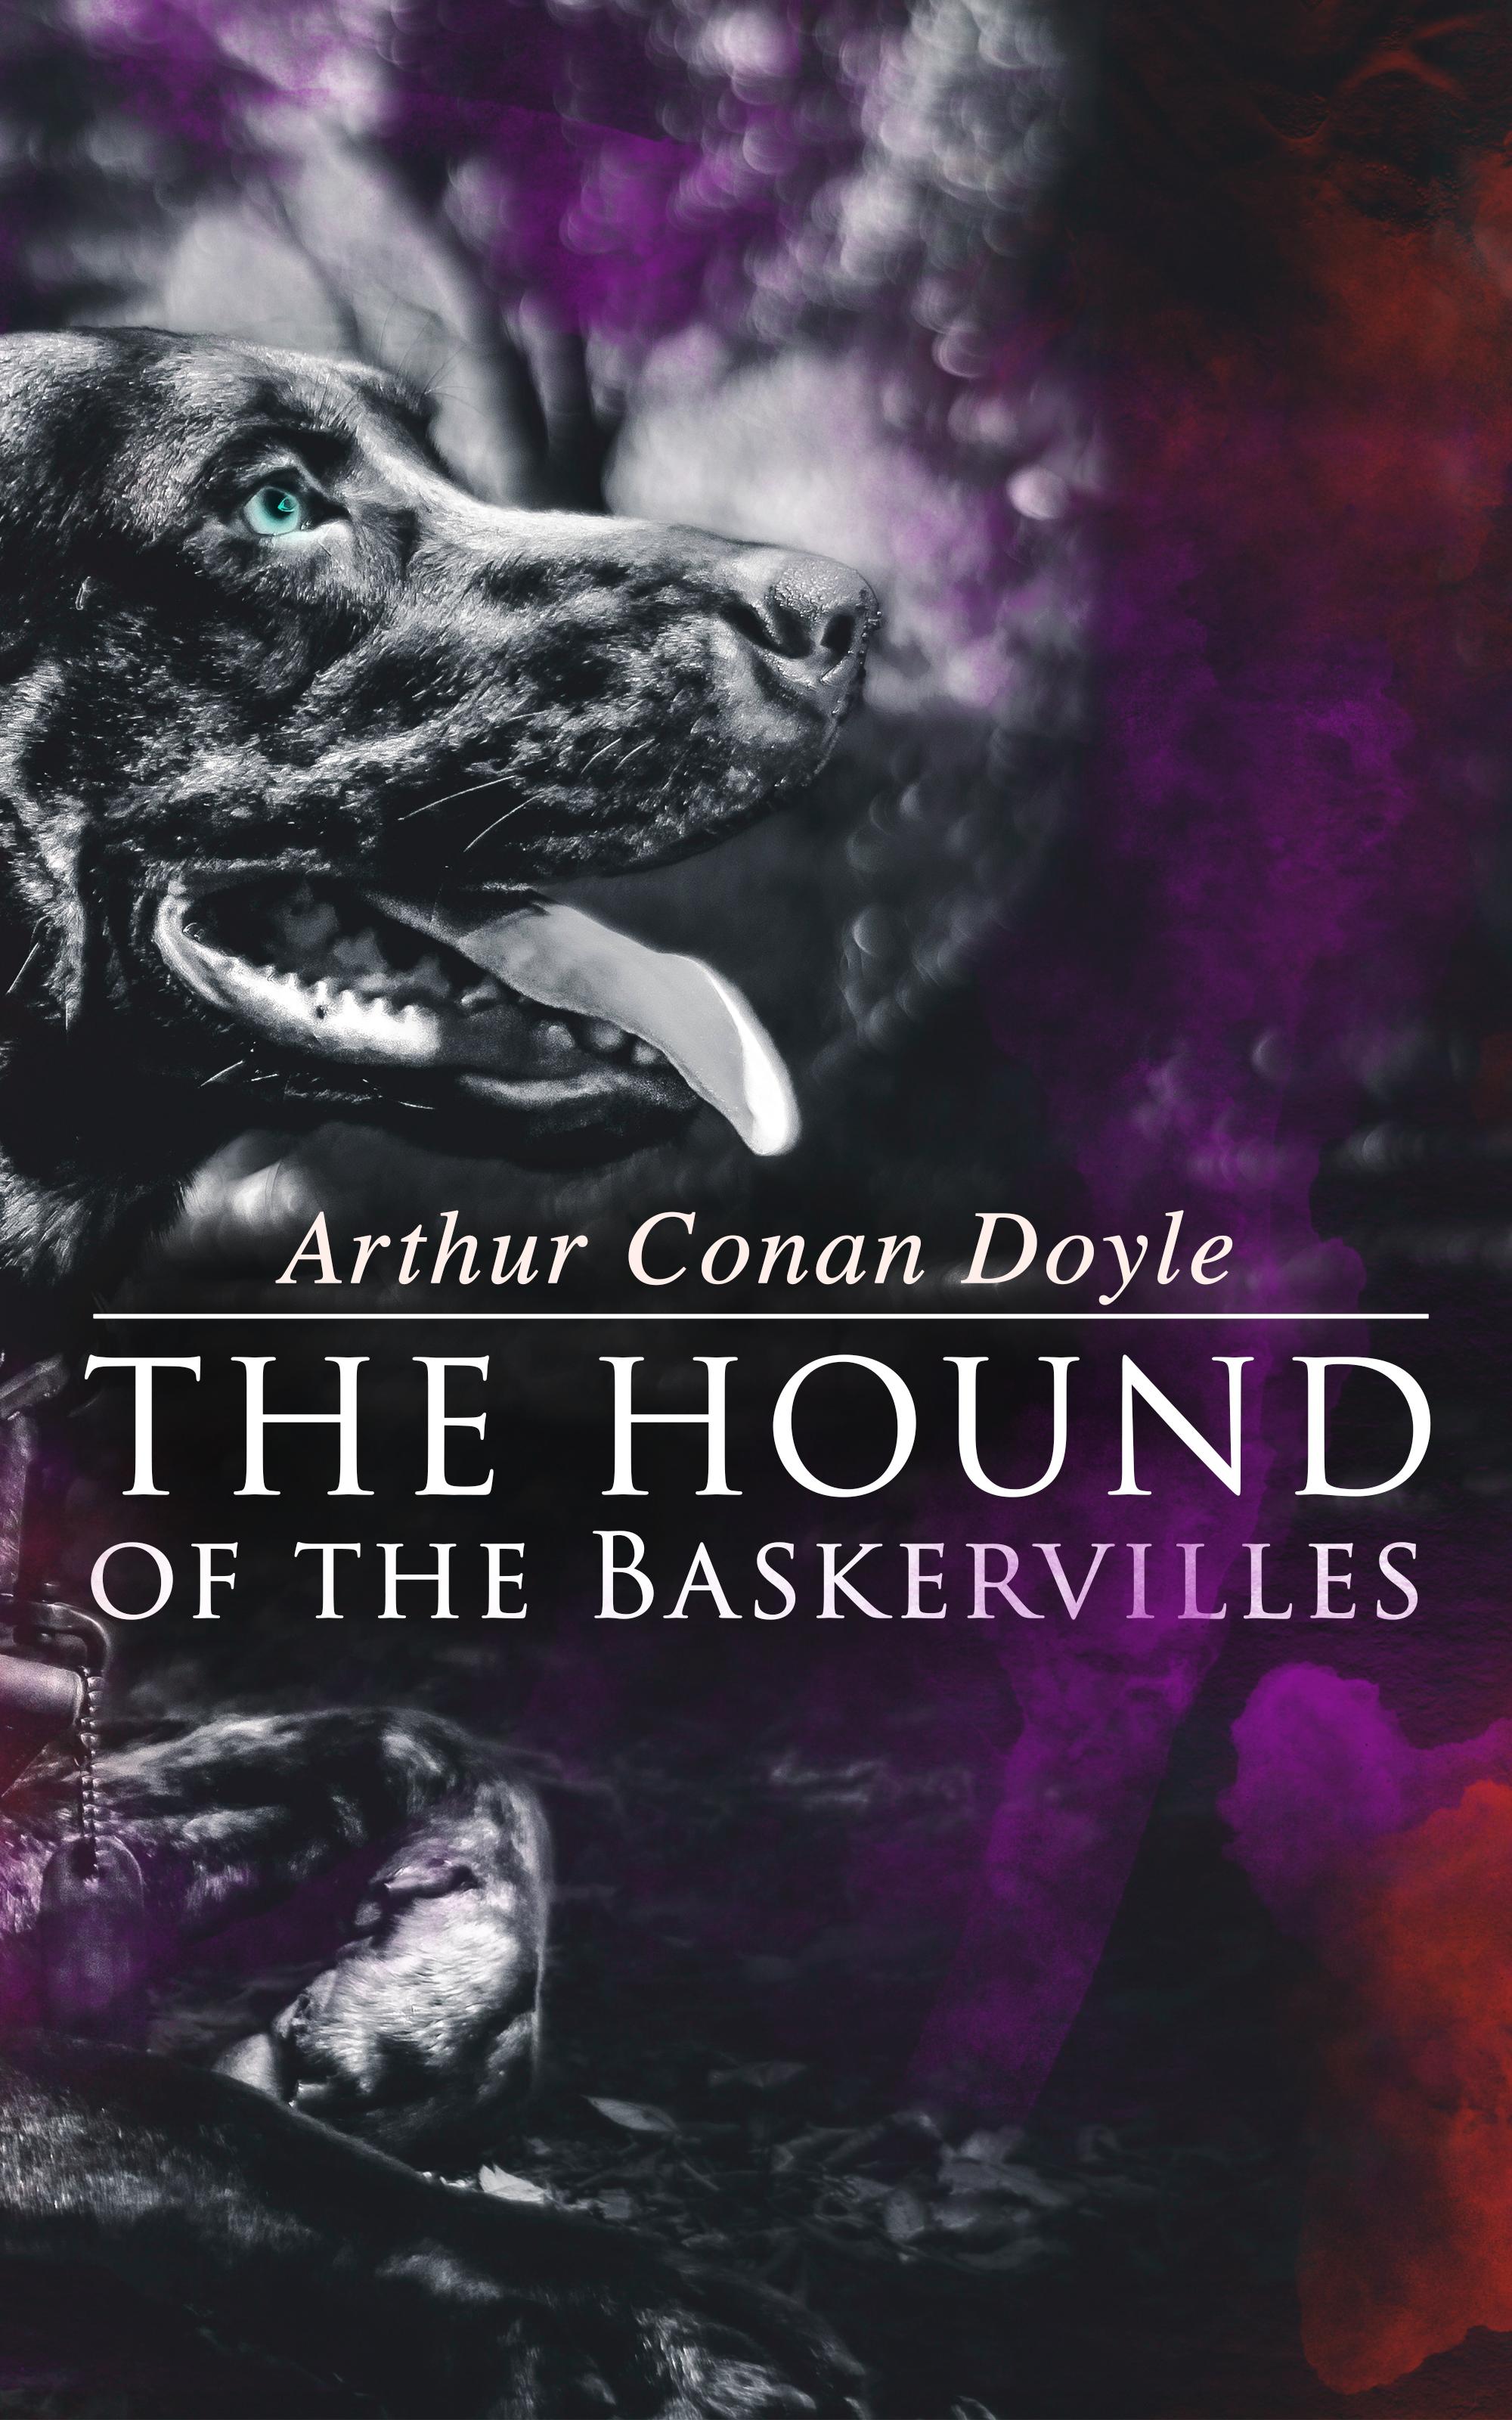 Артур Конан Дойл The Hound of the Baskervilles артур конан дойл the sign of the four